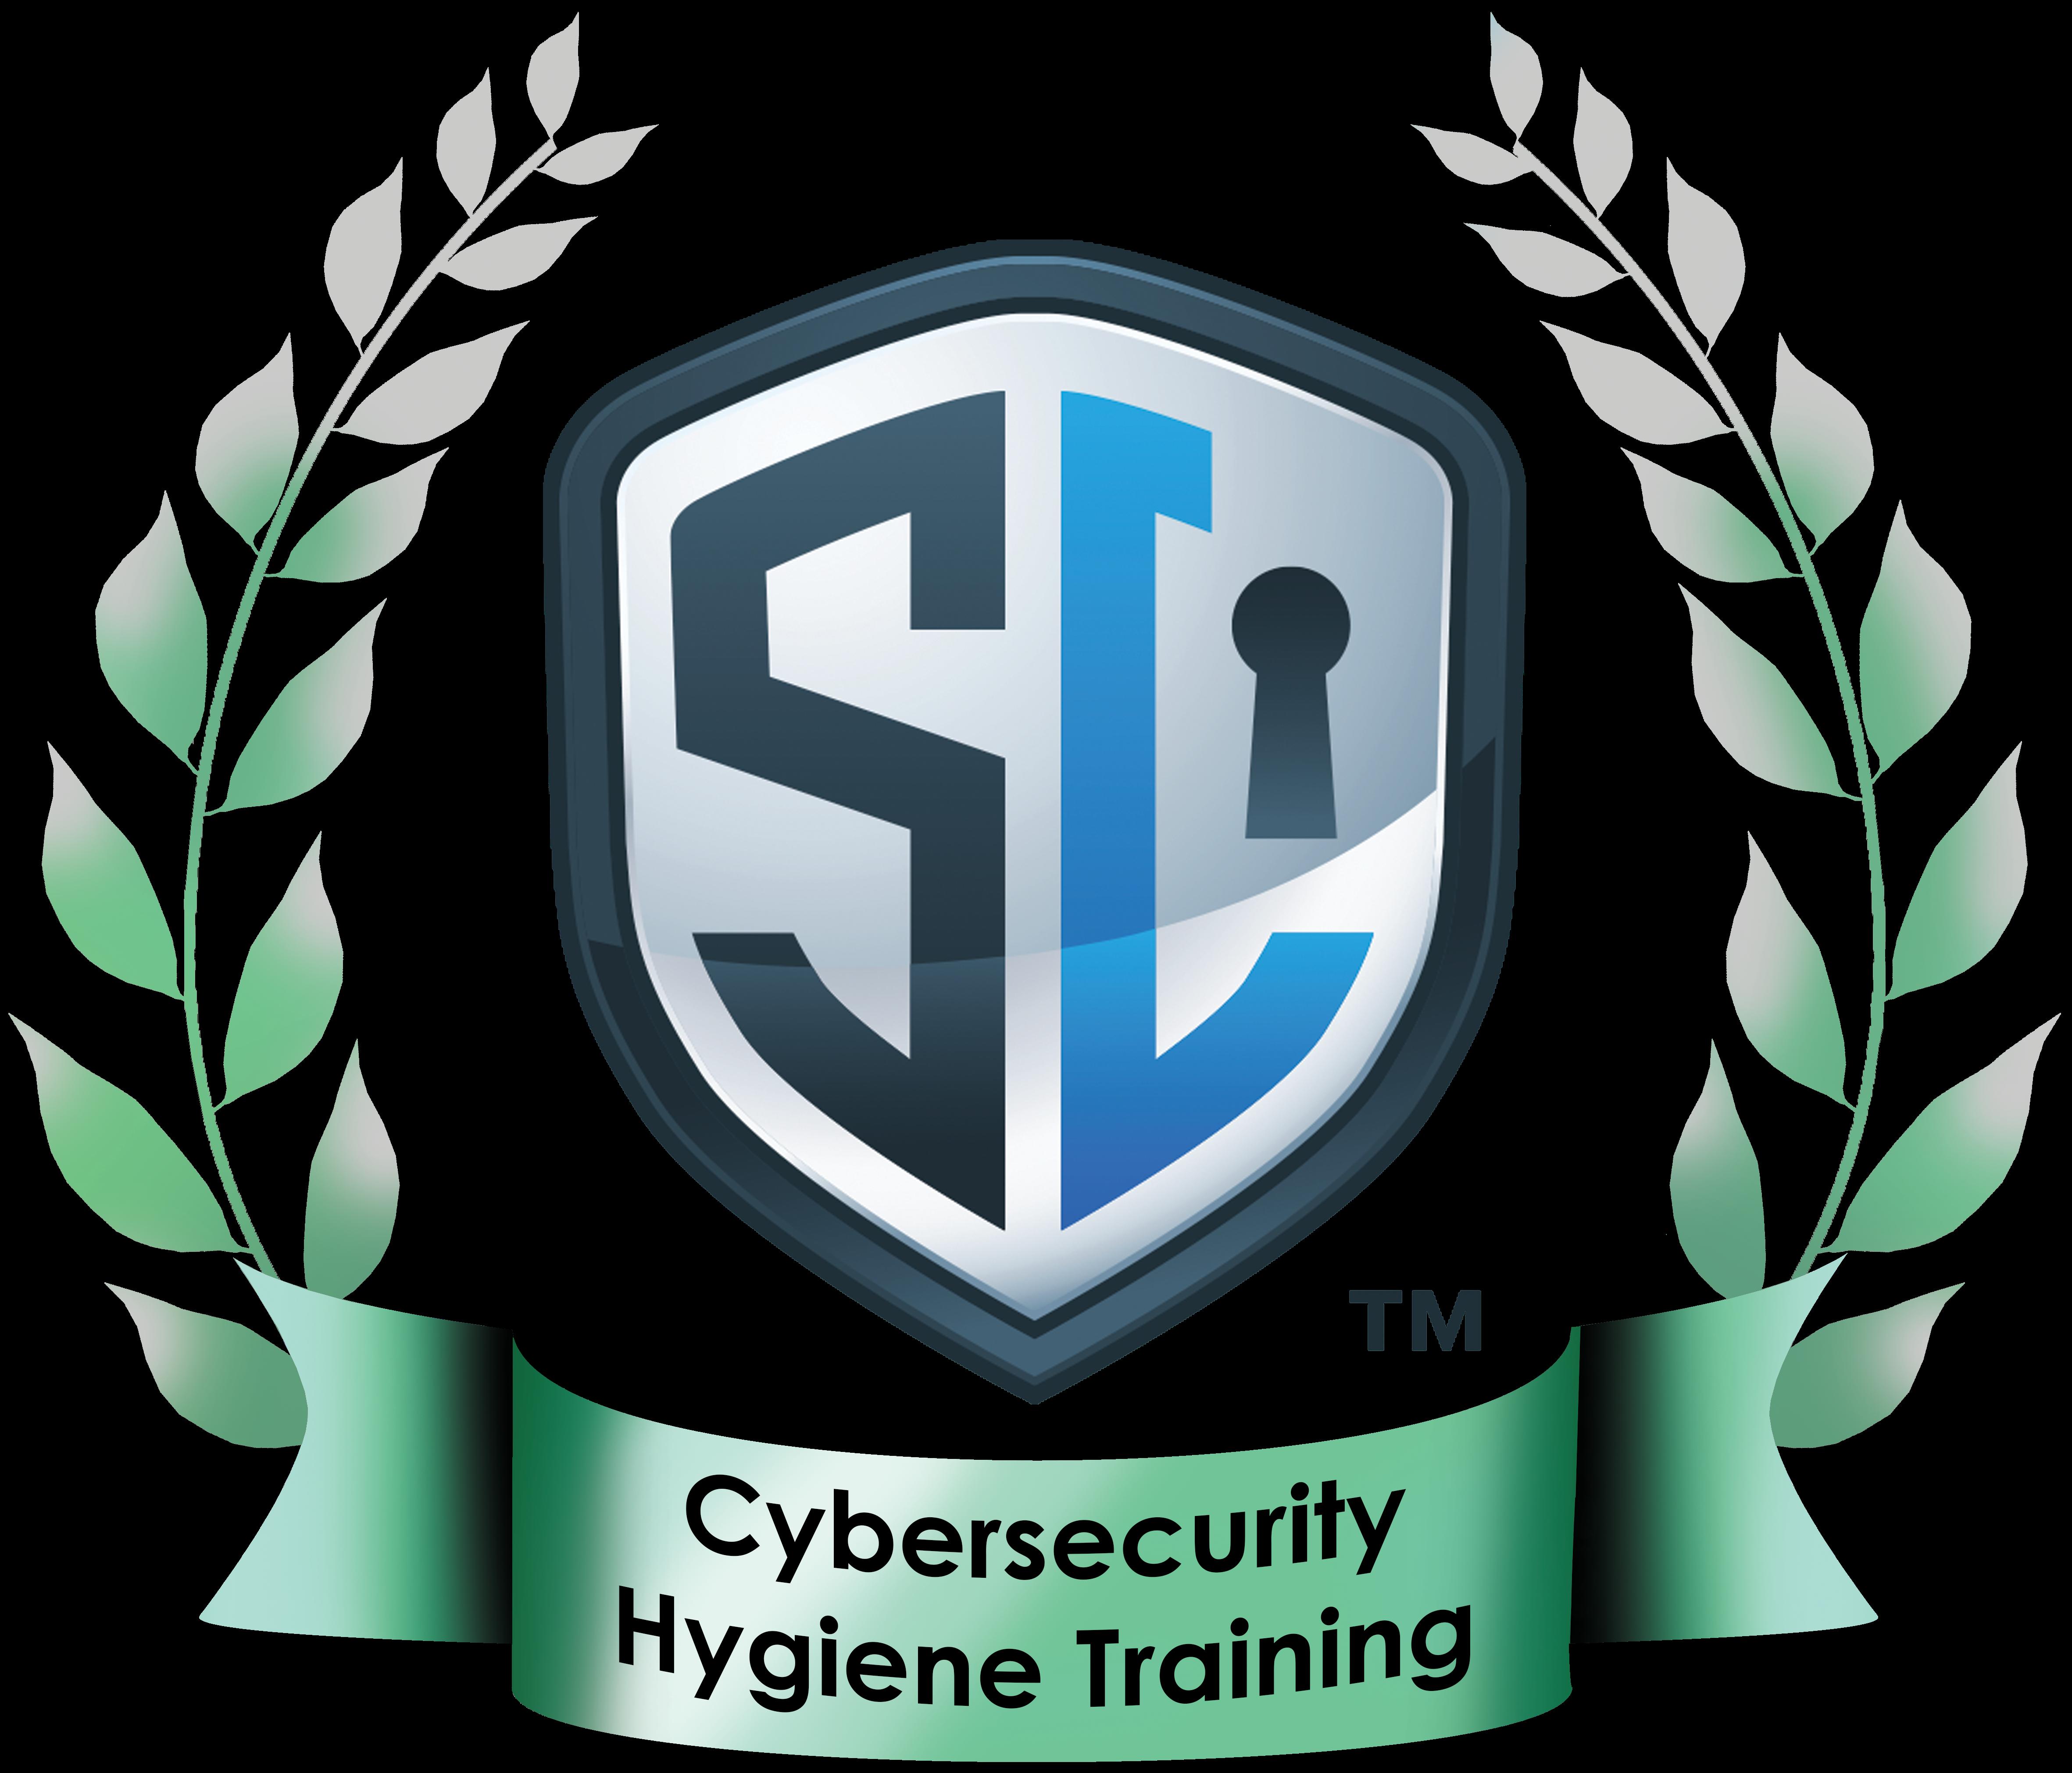 Cybersecurity_Hygiene_Training